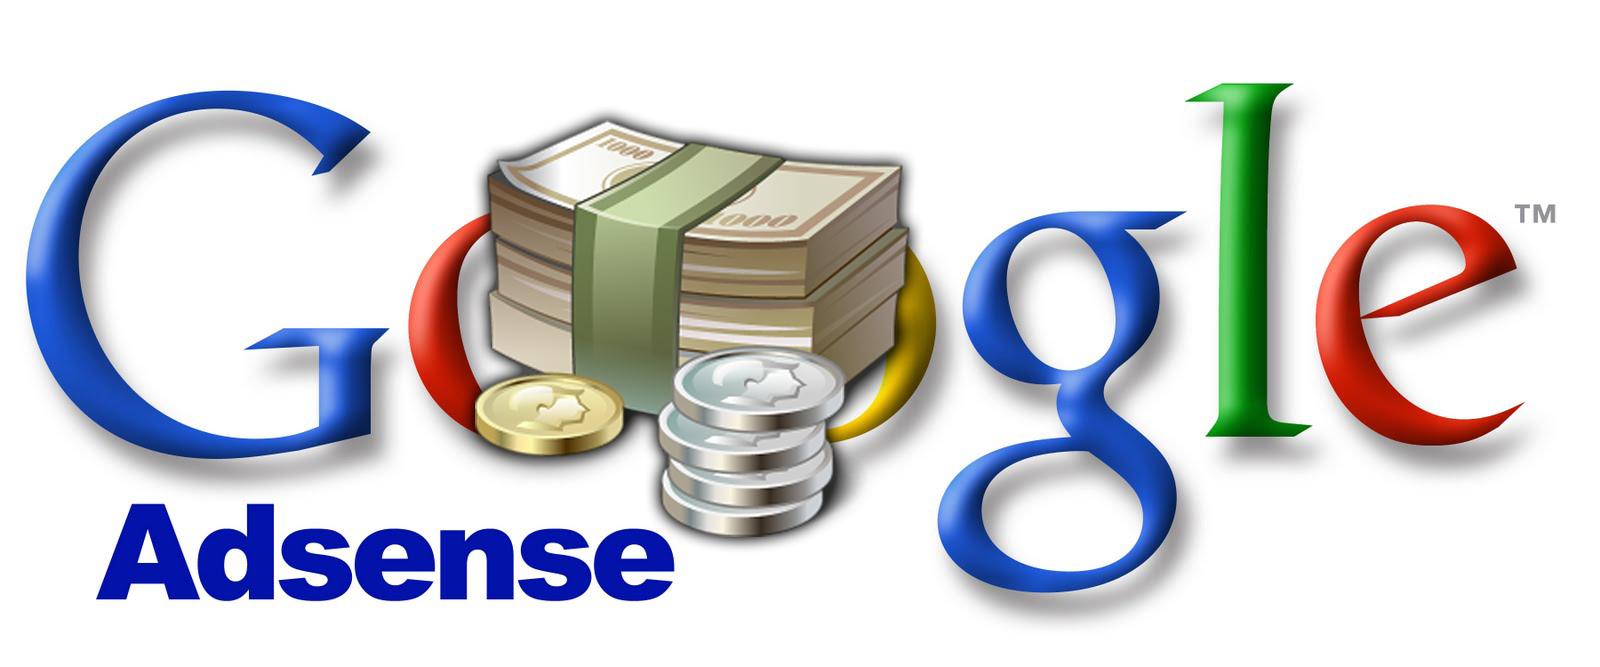 Гугл Адсенс:  7 нововведений